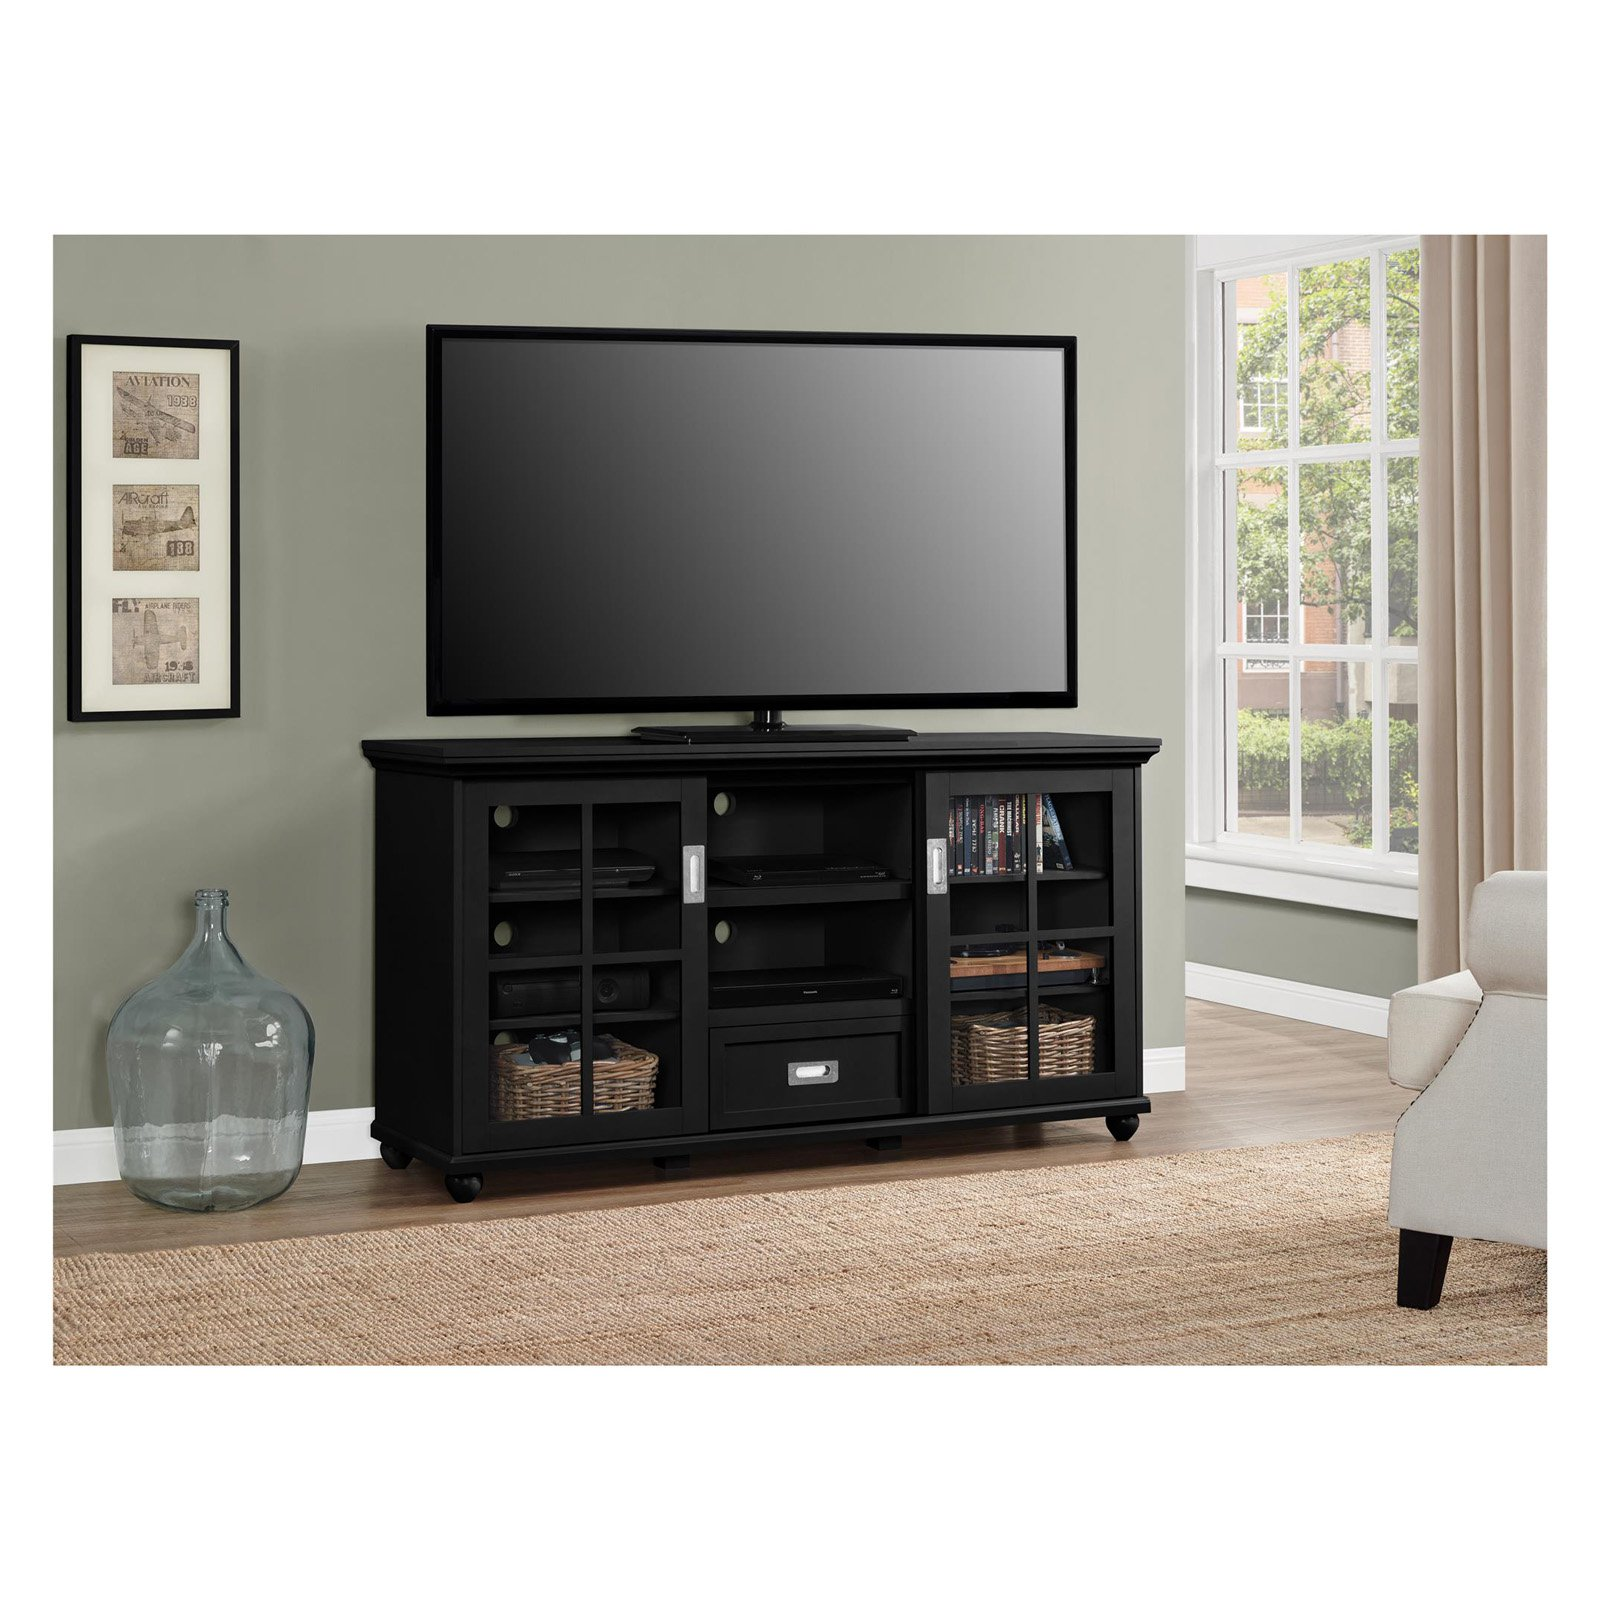 Ameriwood home aaron lane 55 tv stand black walmart com